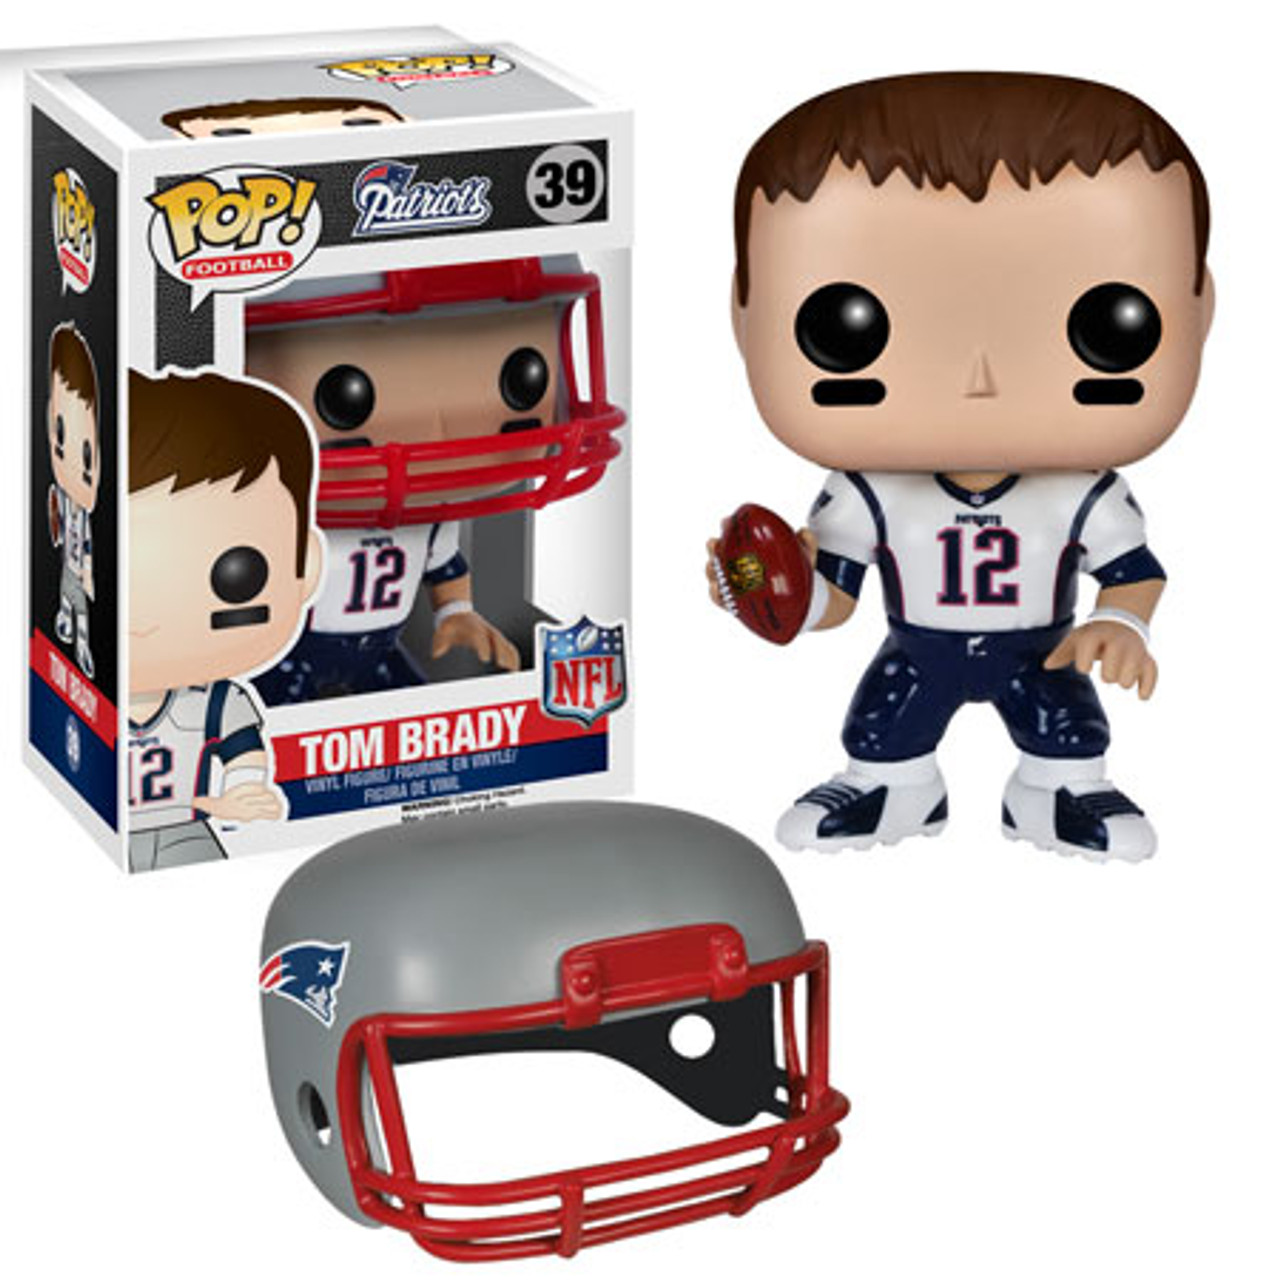 factory authentic 94801 1d2bf NFL New England Patriots Funko POP! Sports Tom Brady Vinyl Figure #39  [White Jersey]